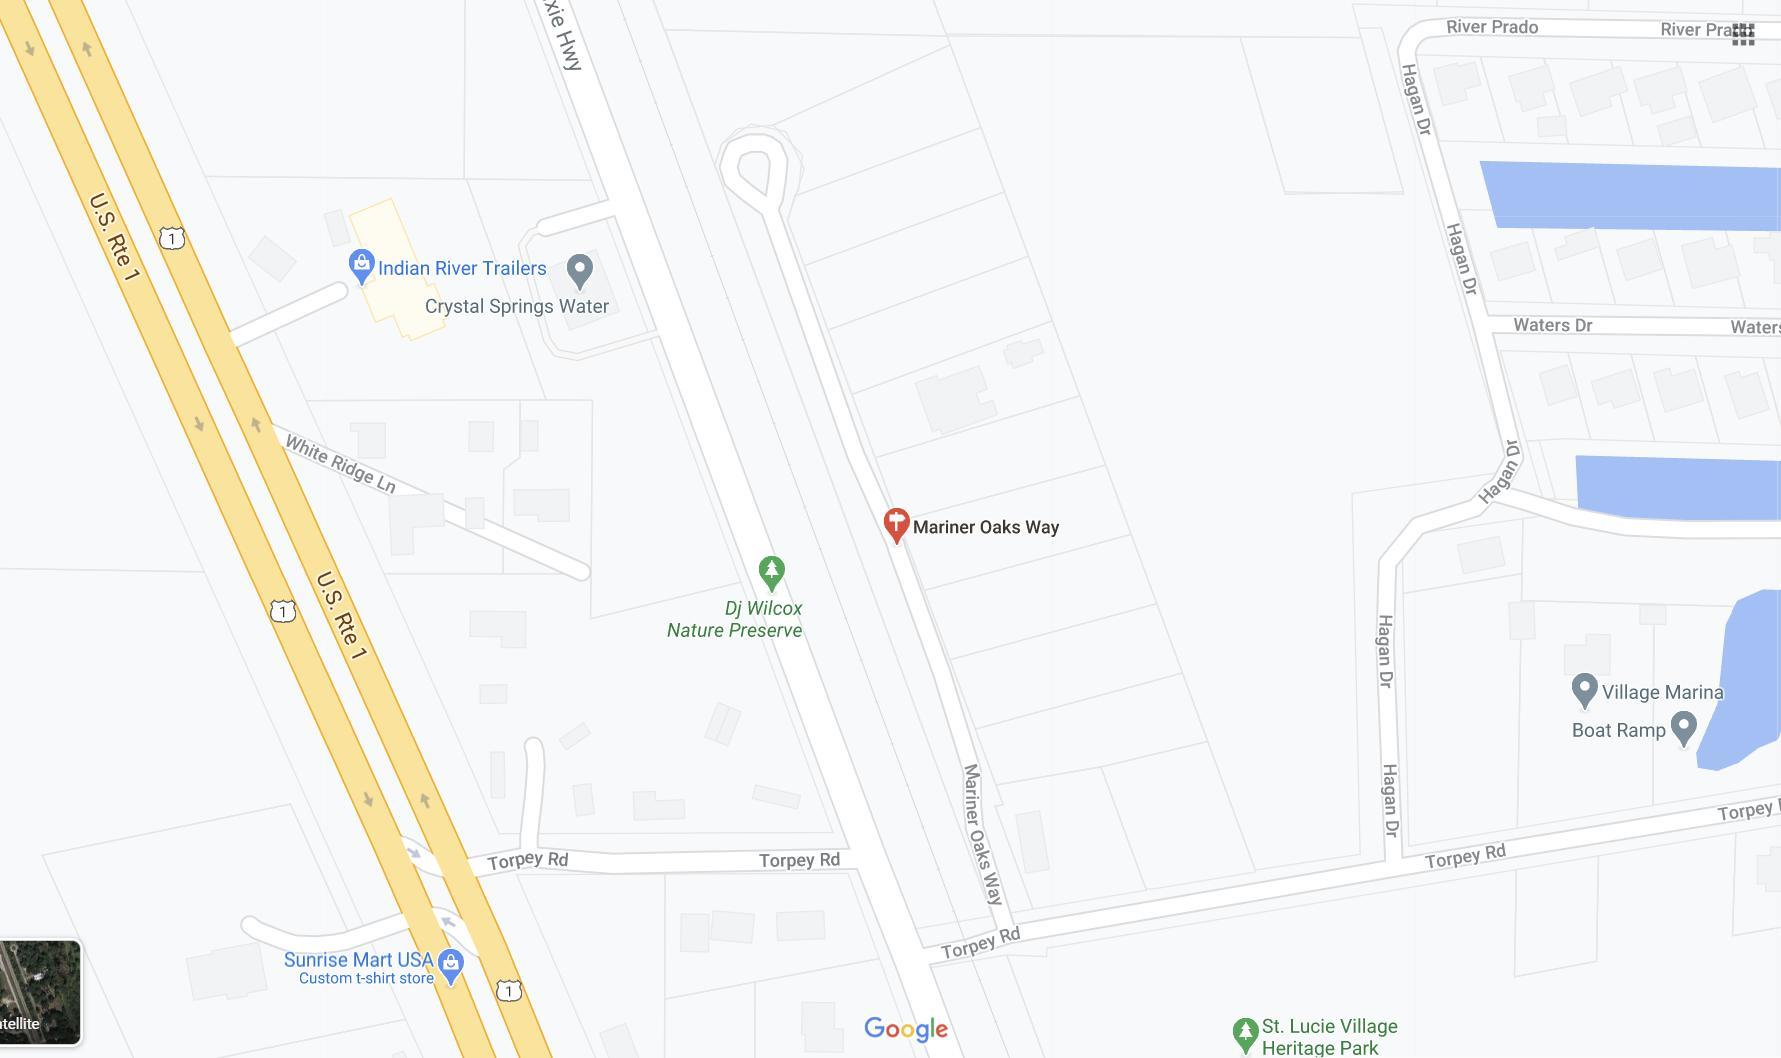 0001 Mariner Oaks Way, Fort Pierce, FL 34946